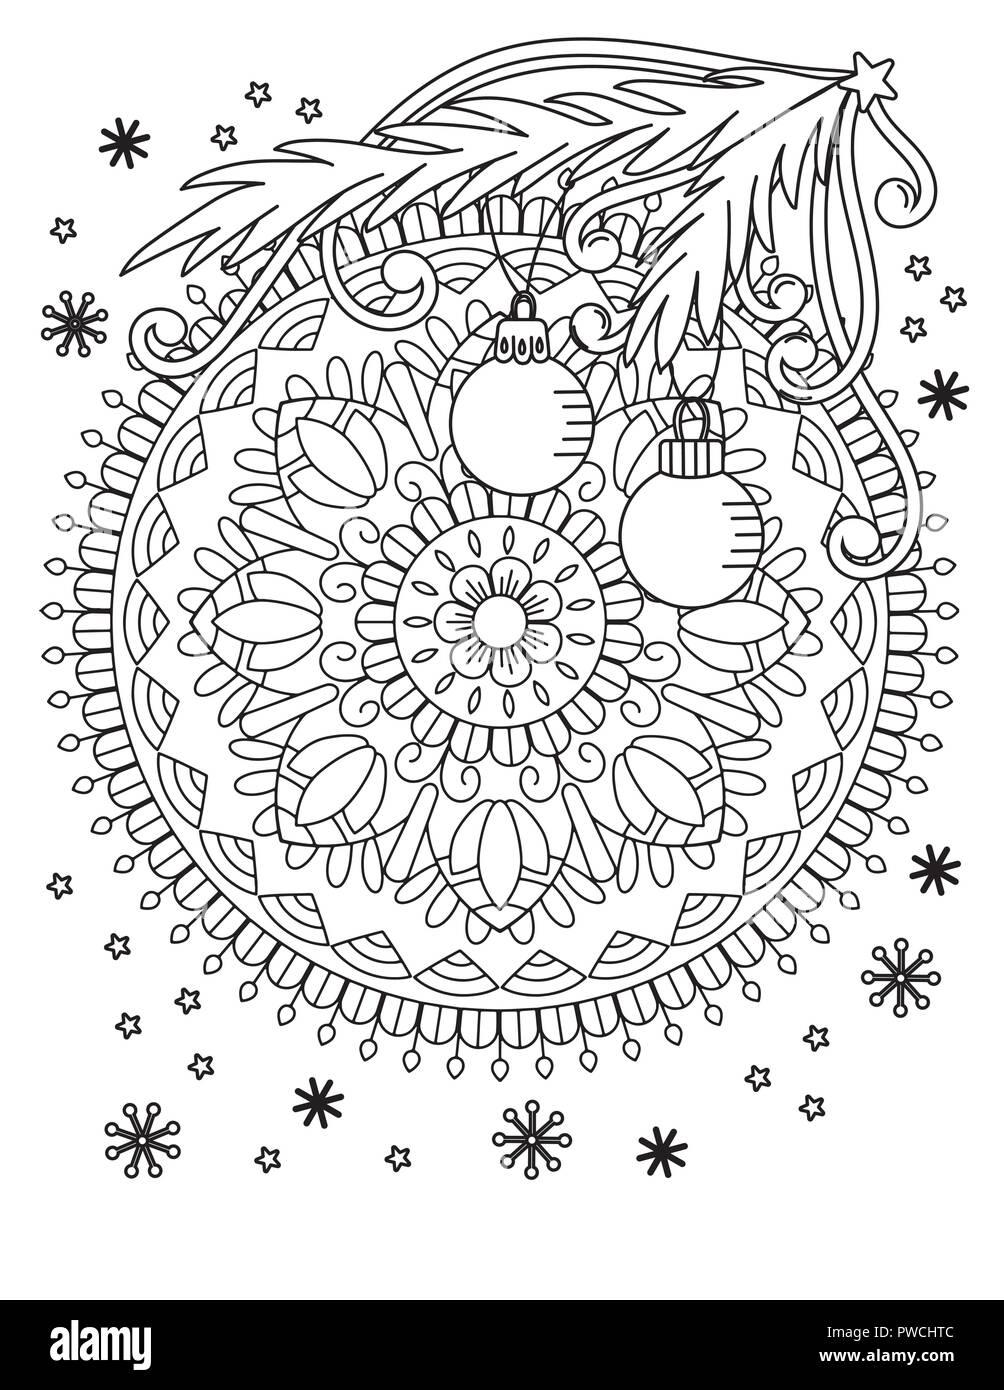 Christmas Mandala Coloring Page Adult Coloring Book Holiday Decore Balls And Snowflake Hand Drawn Vector Illustration Stock Vector Image Art Alamy